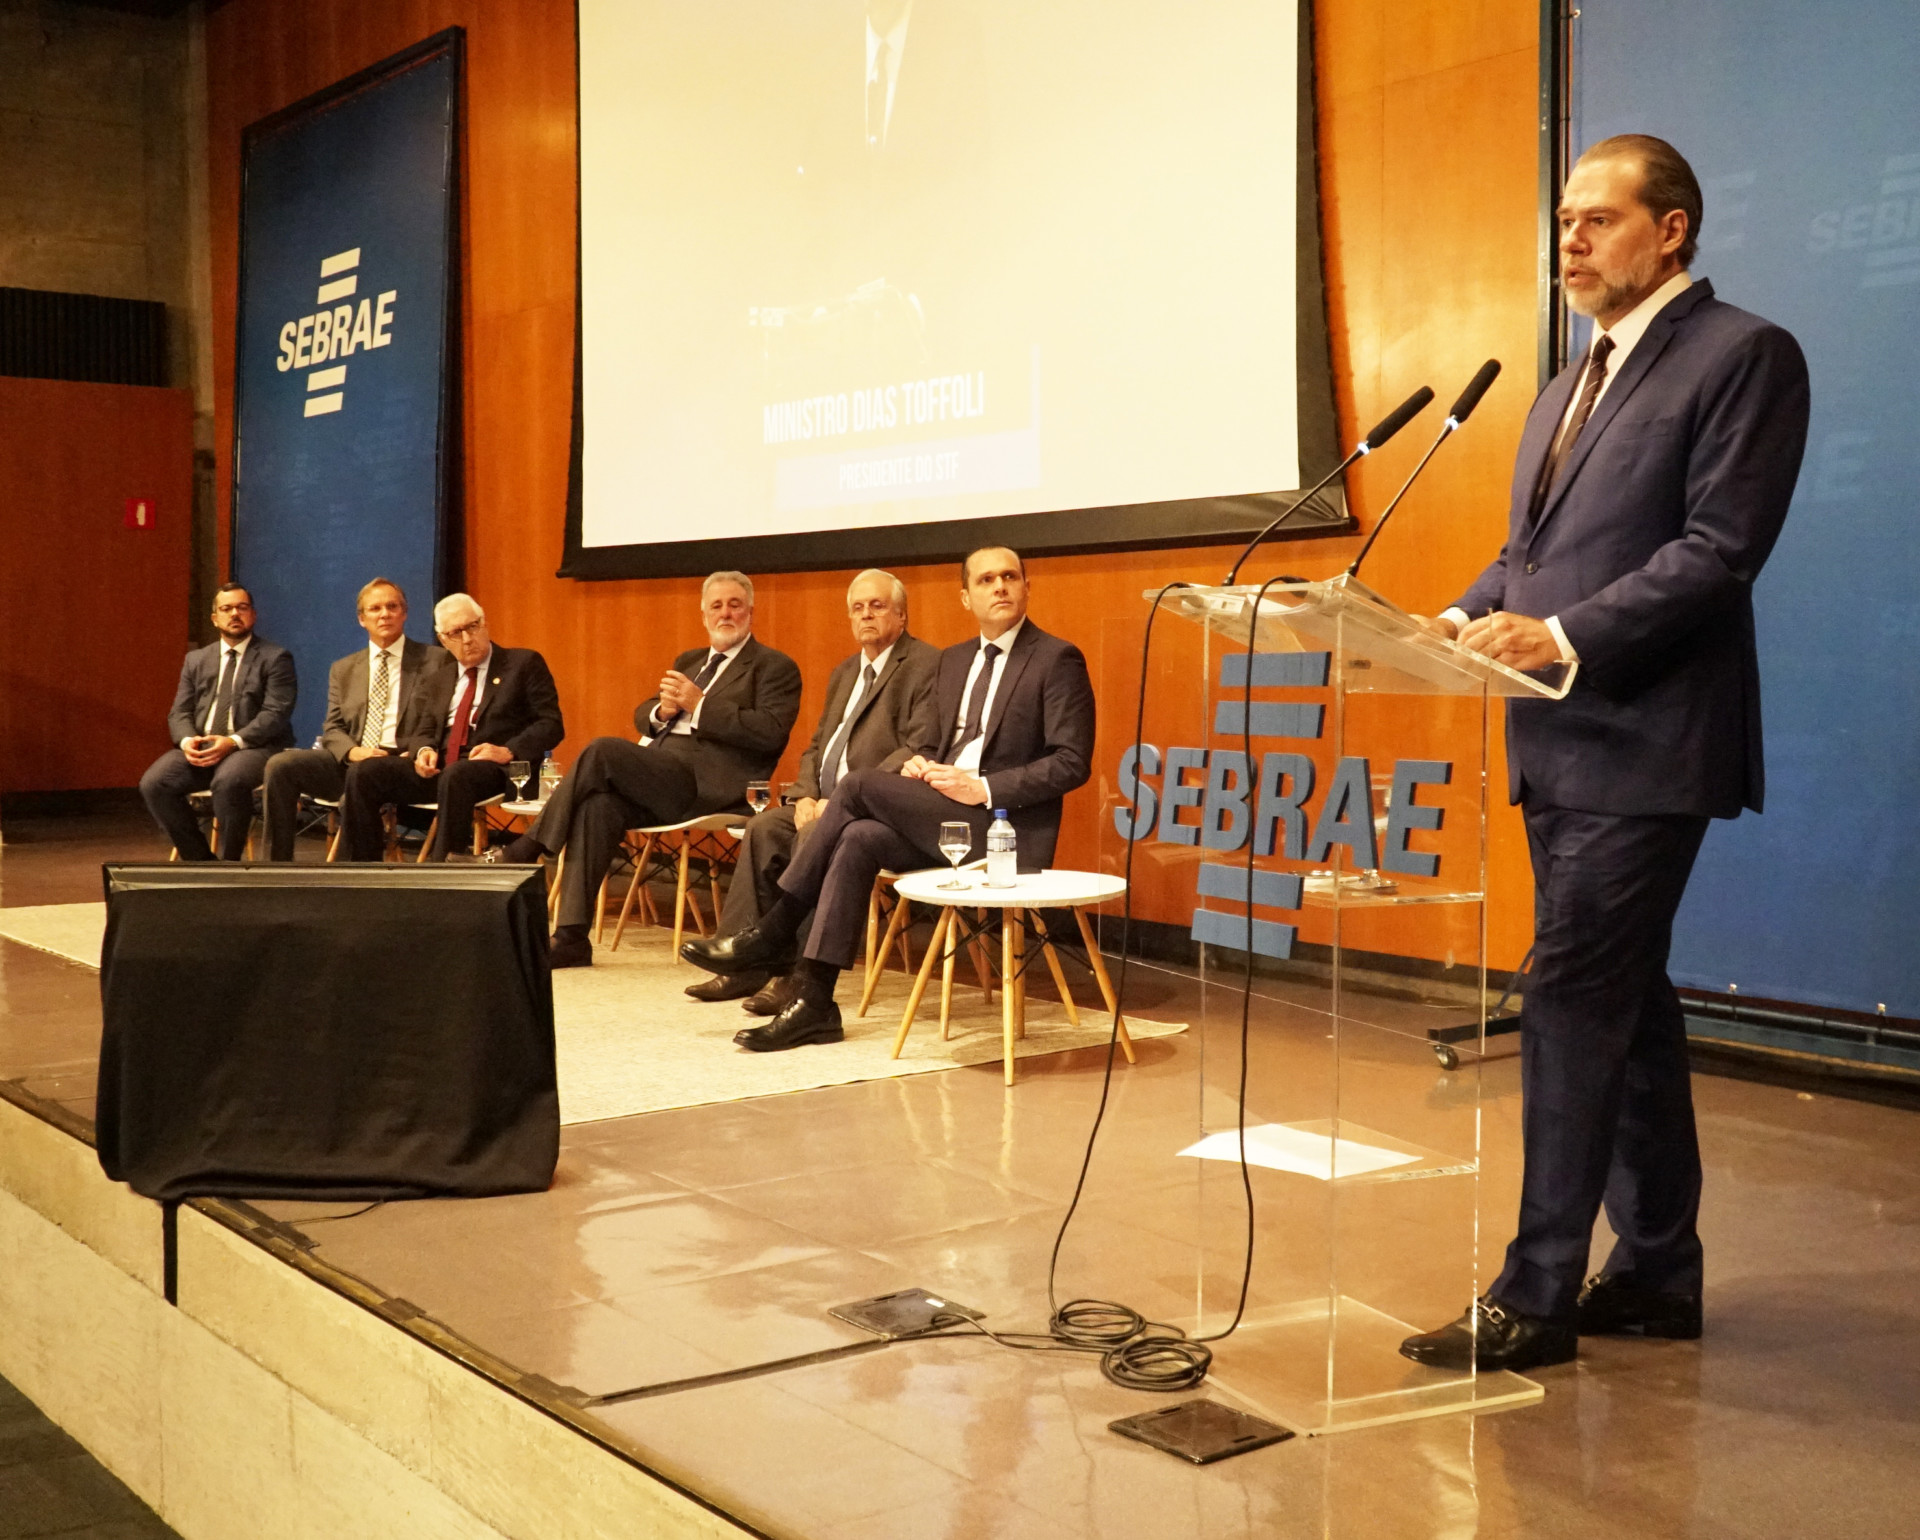 Presidente do Supremo Tribunal Federal, Ministro Dias Toffoli realiza palestra magna no Sebrae Nacional